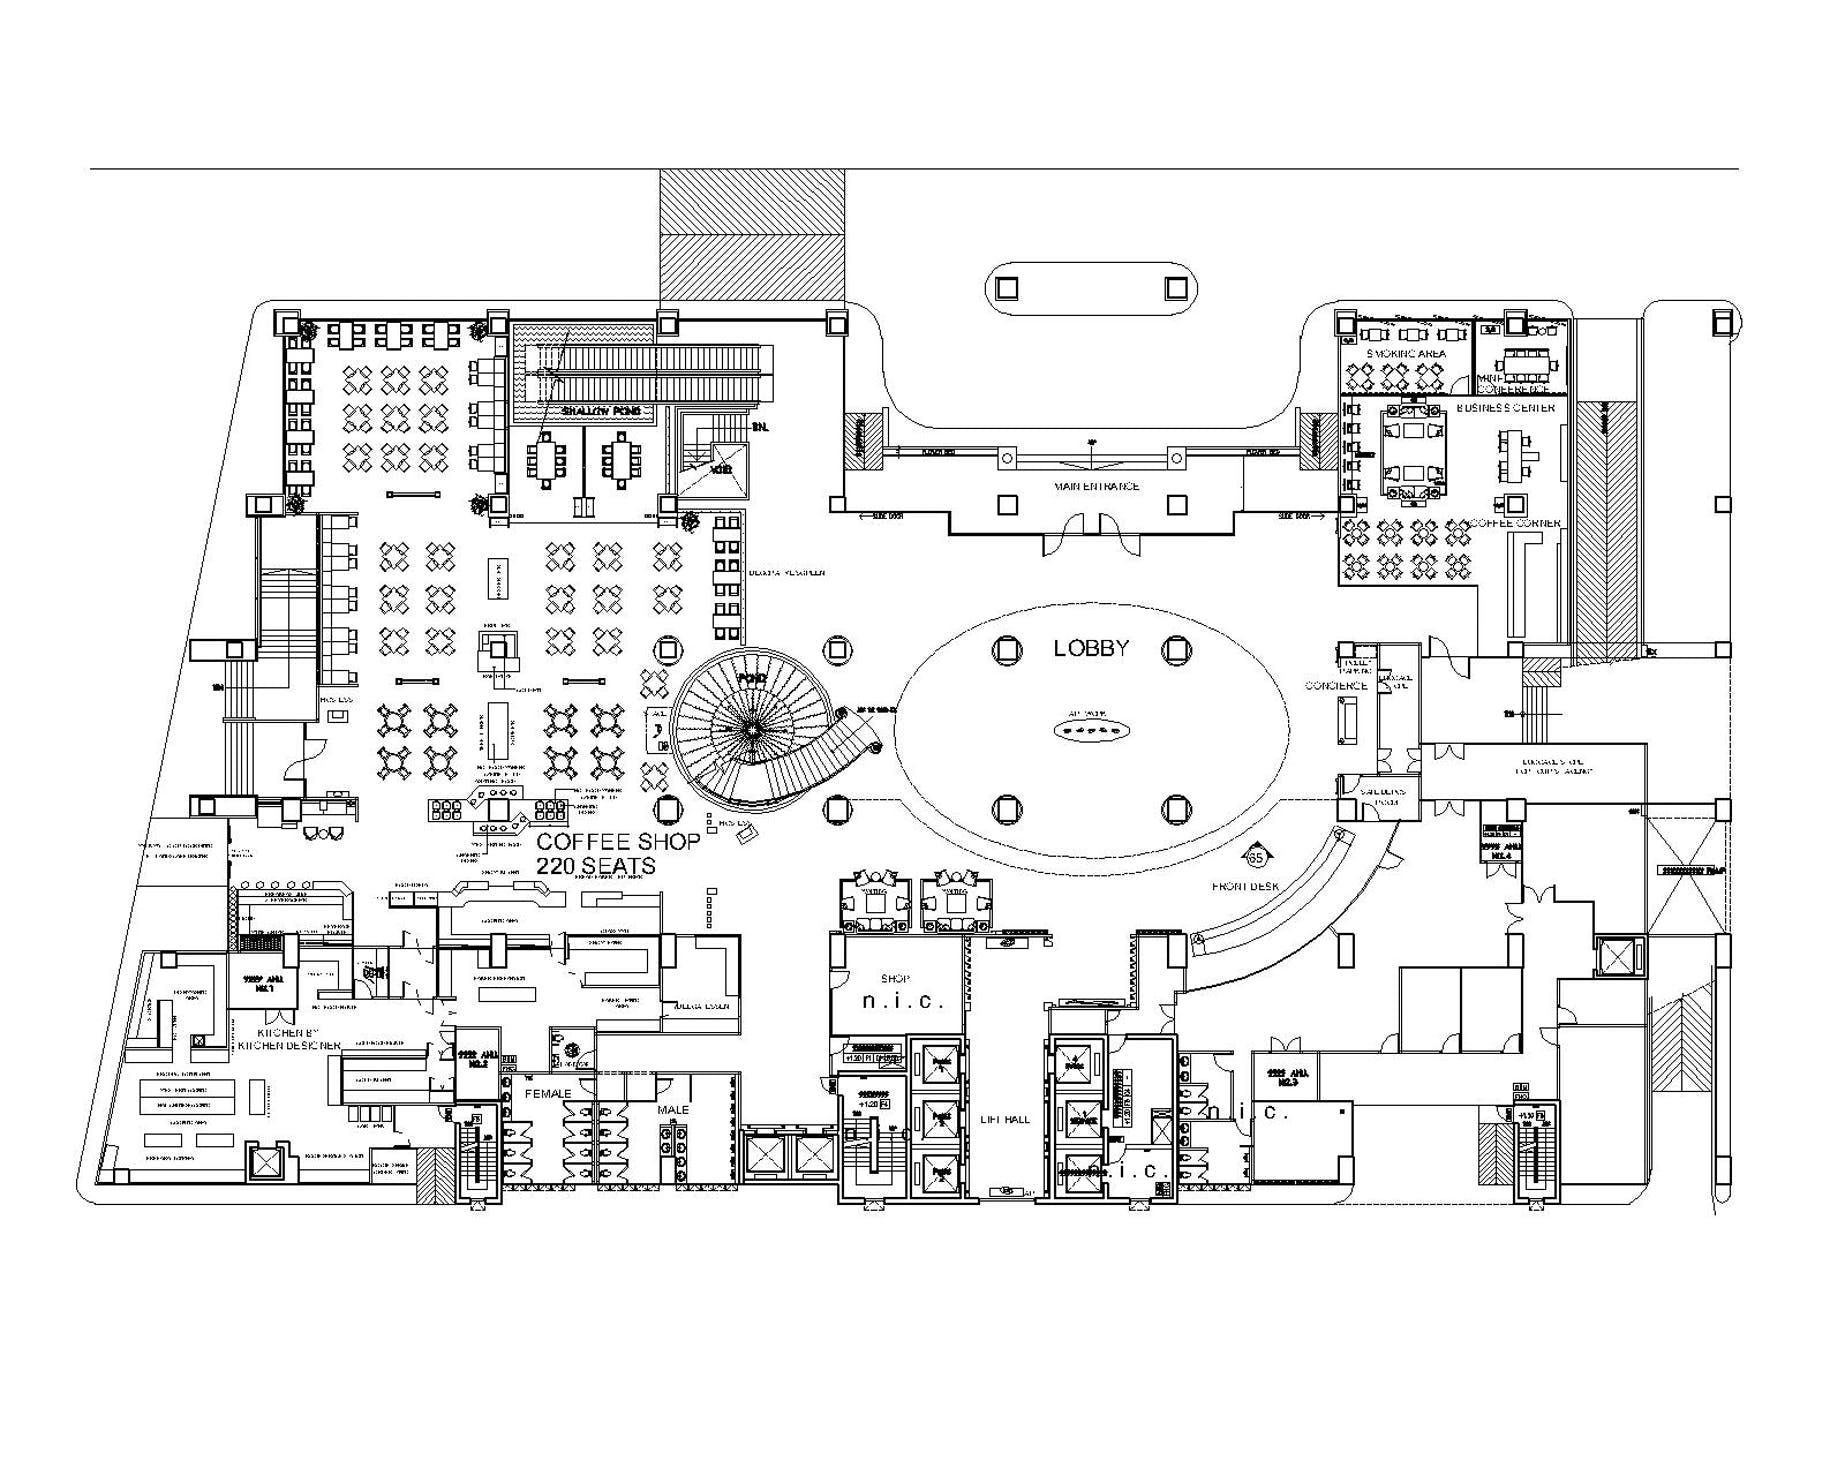 Ground floor plan hotel pinterest ground floor for Great office layouts